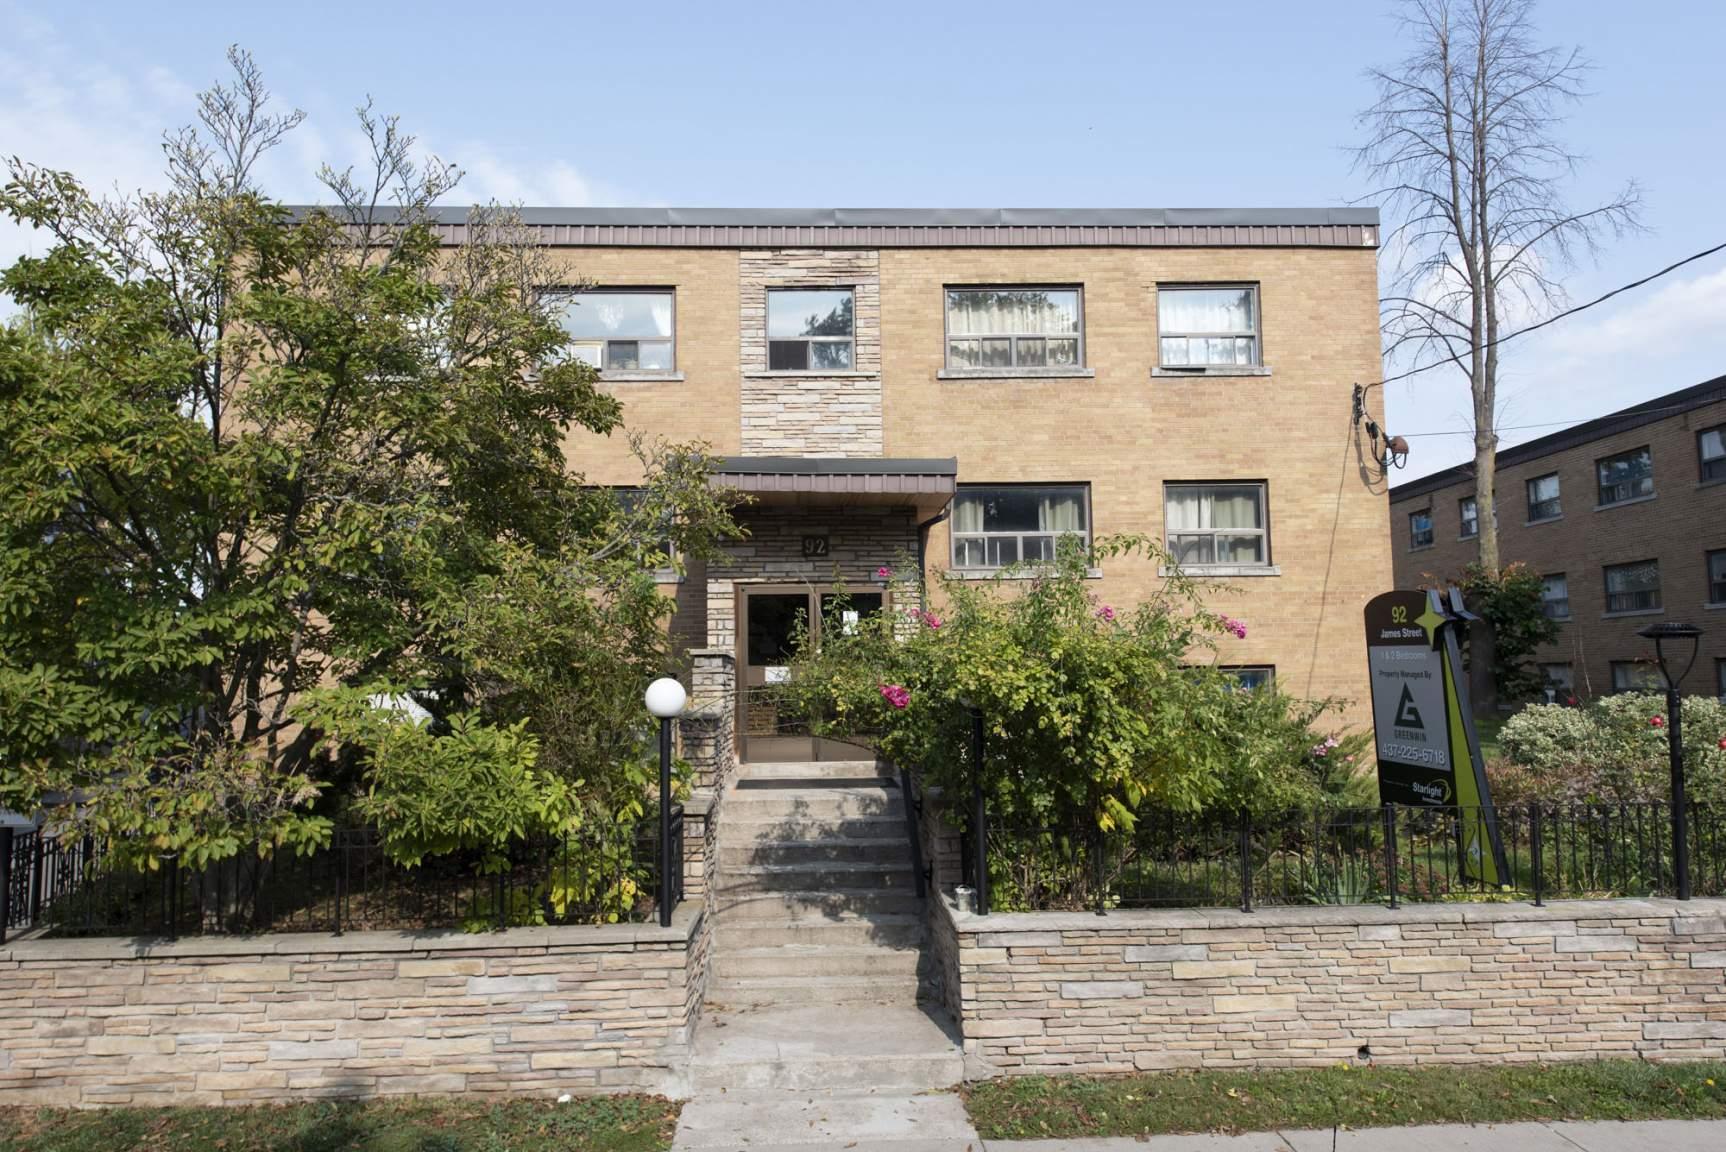 90, 92 James St. & 25 Villa Rd.